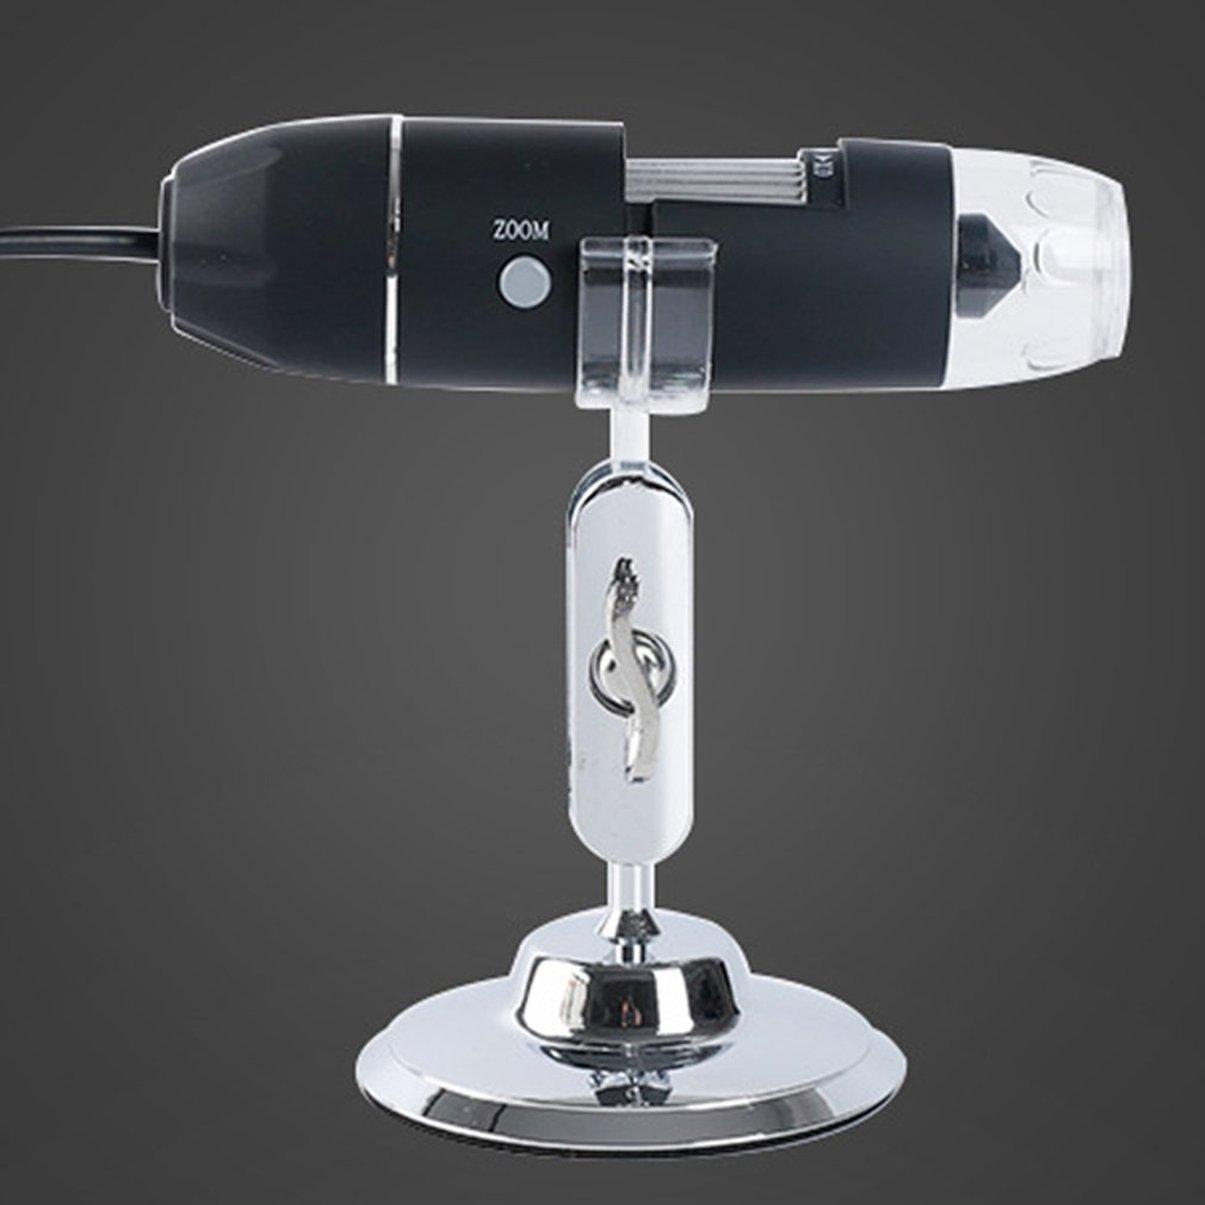 JullyeleESgant 1600X HD Lupa electrónica Microscopio Lupa Digital portátil Lupa Microscopio médica Industrial Microscopio USB con Soporte de Metal 04faeb